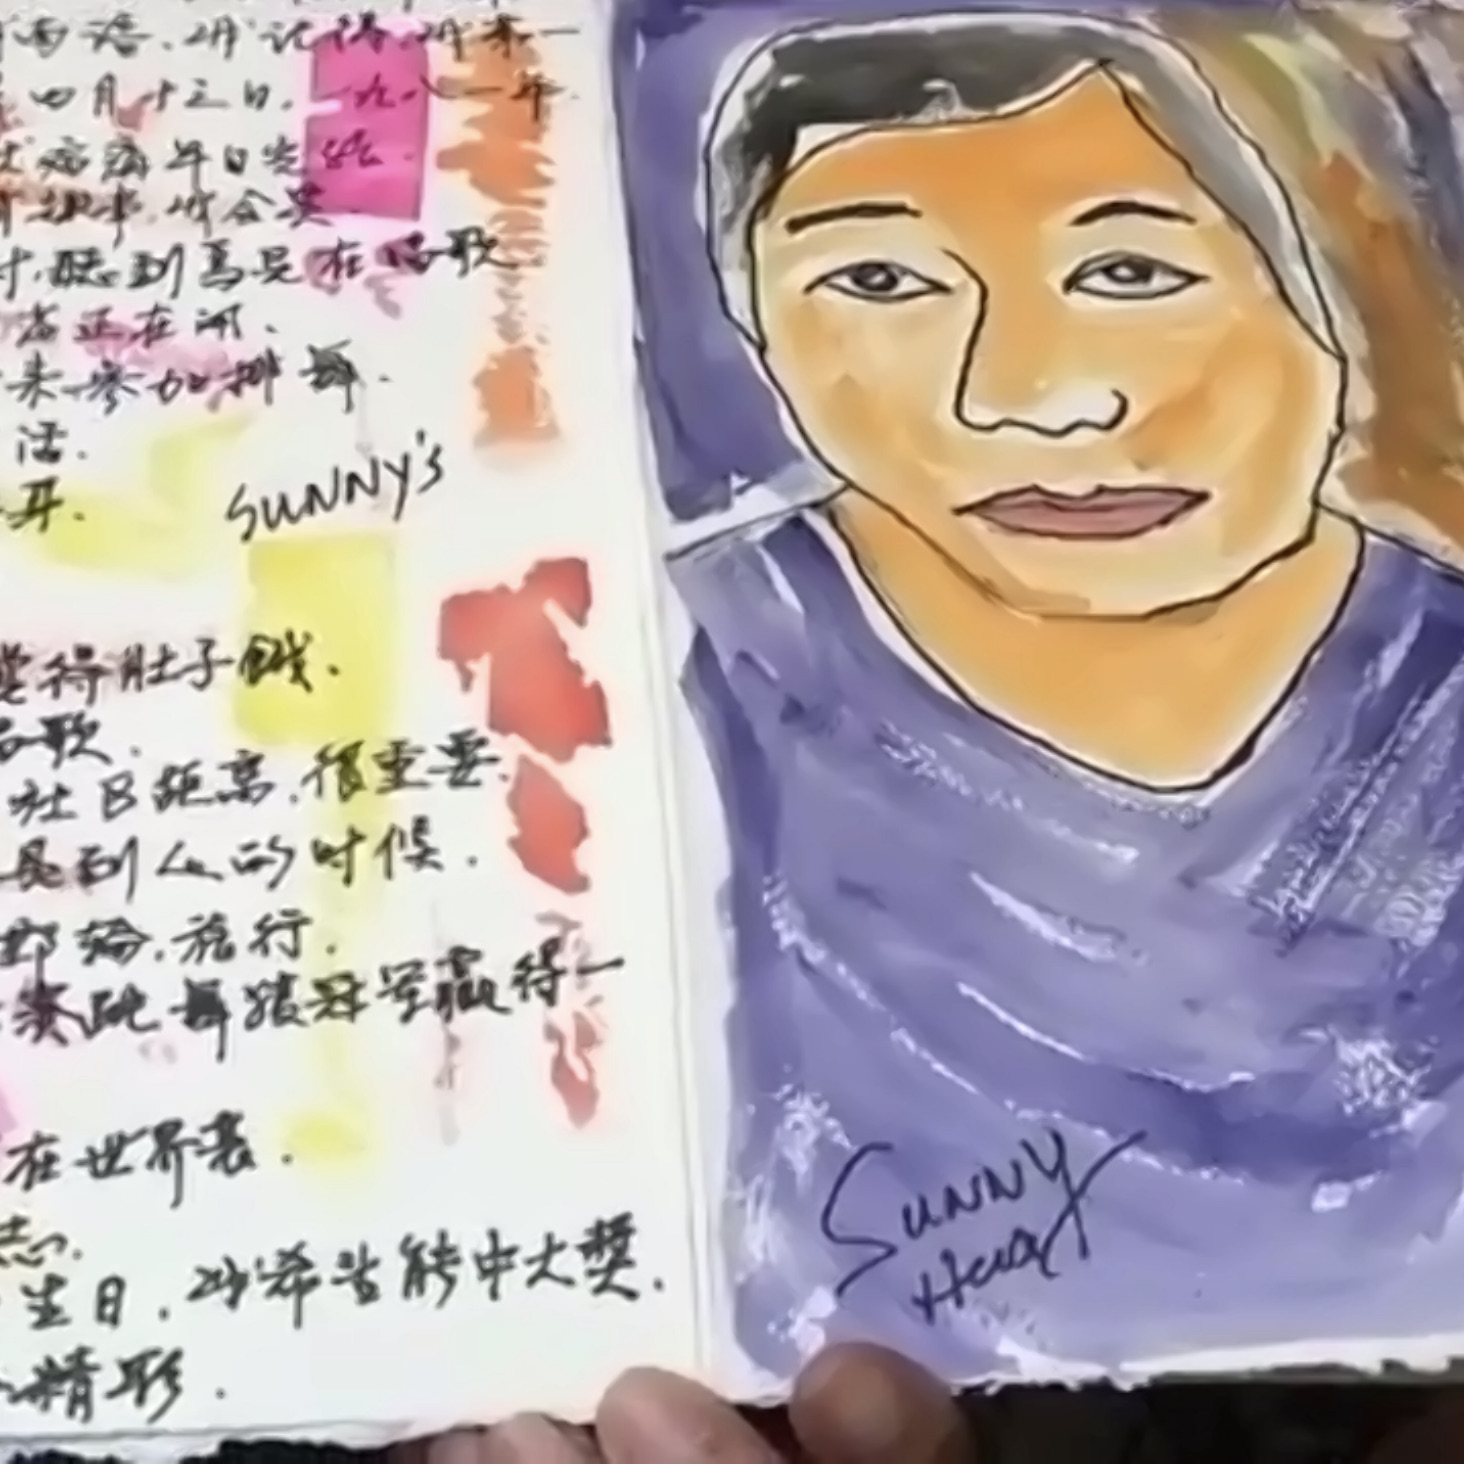 22.c.Sunny-portrait